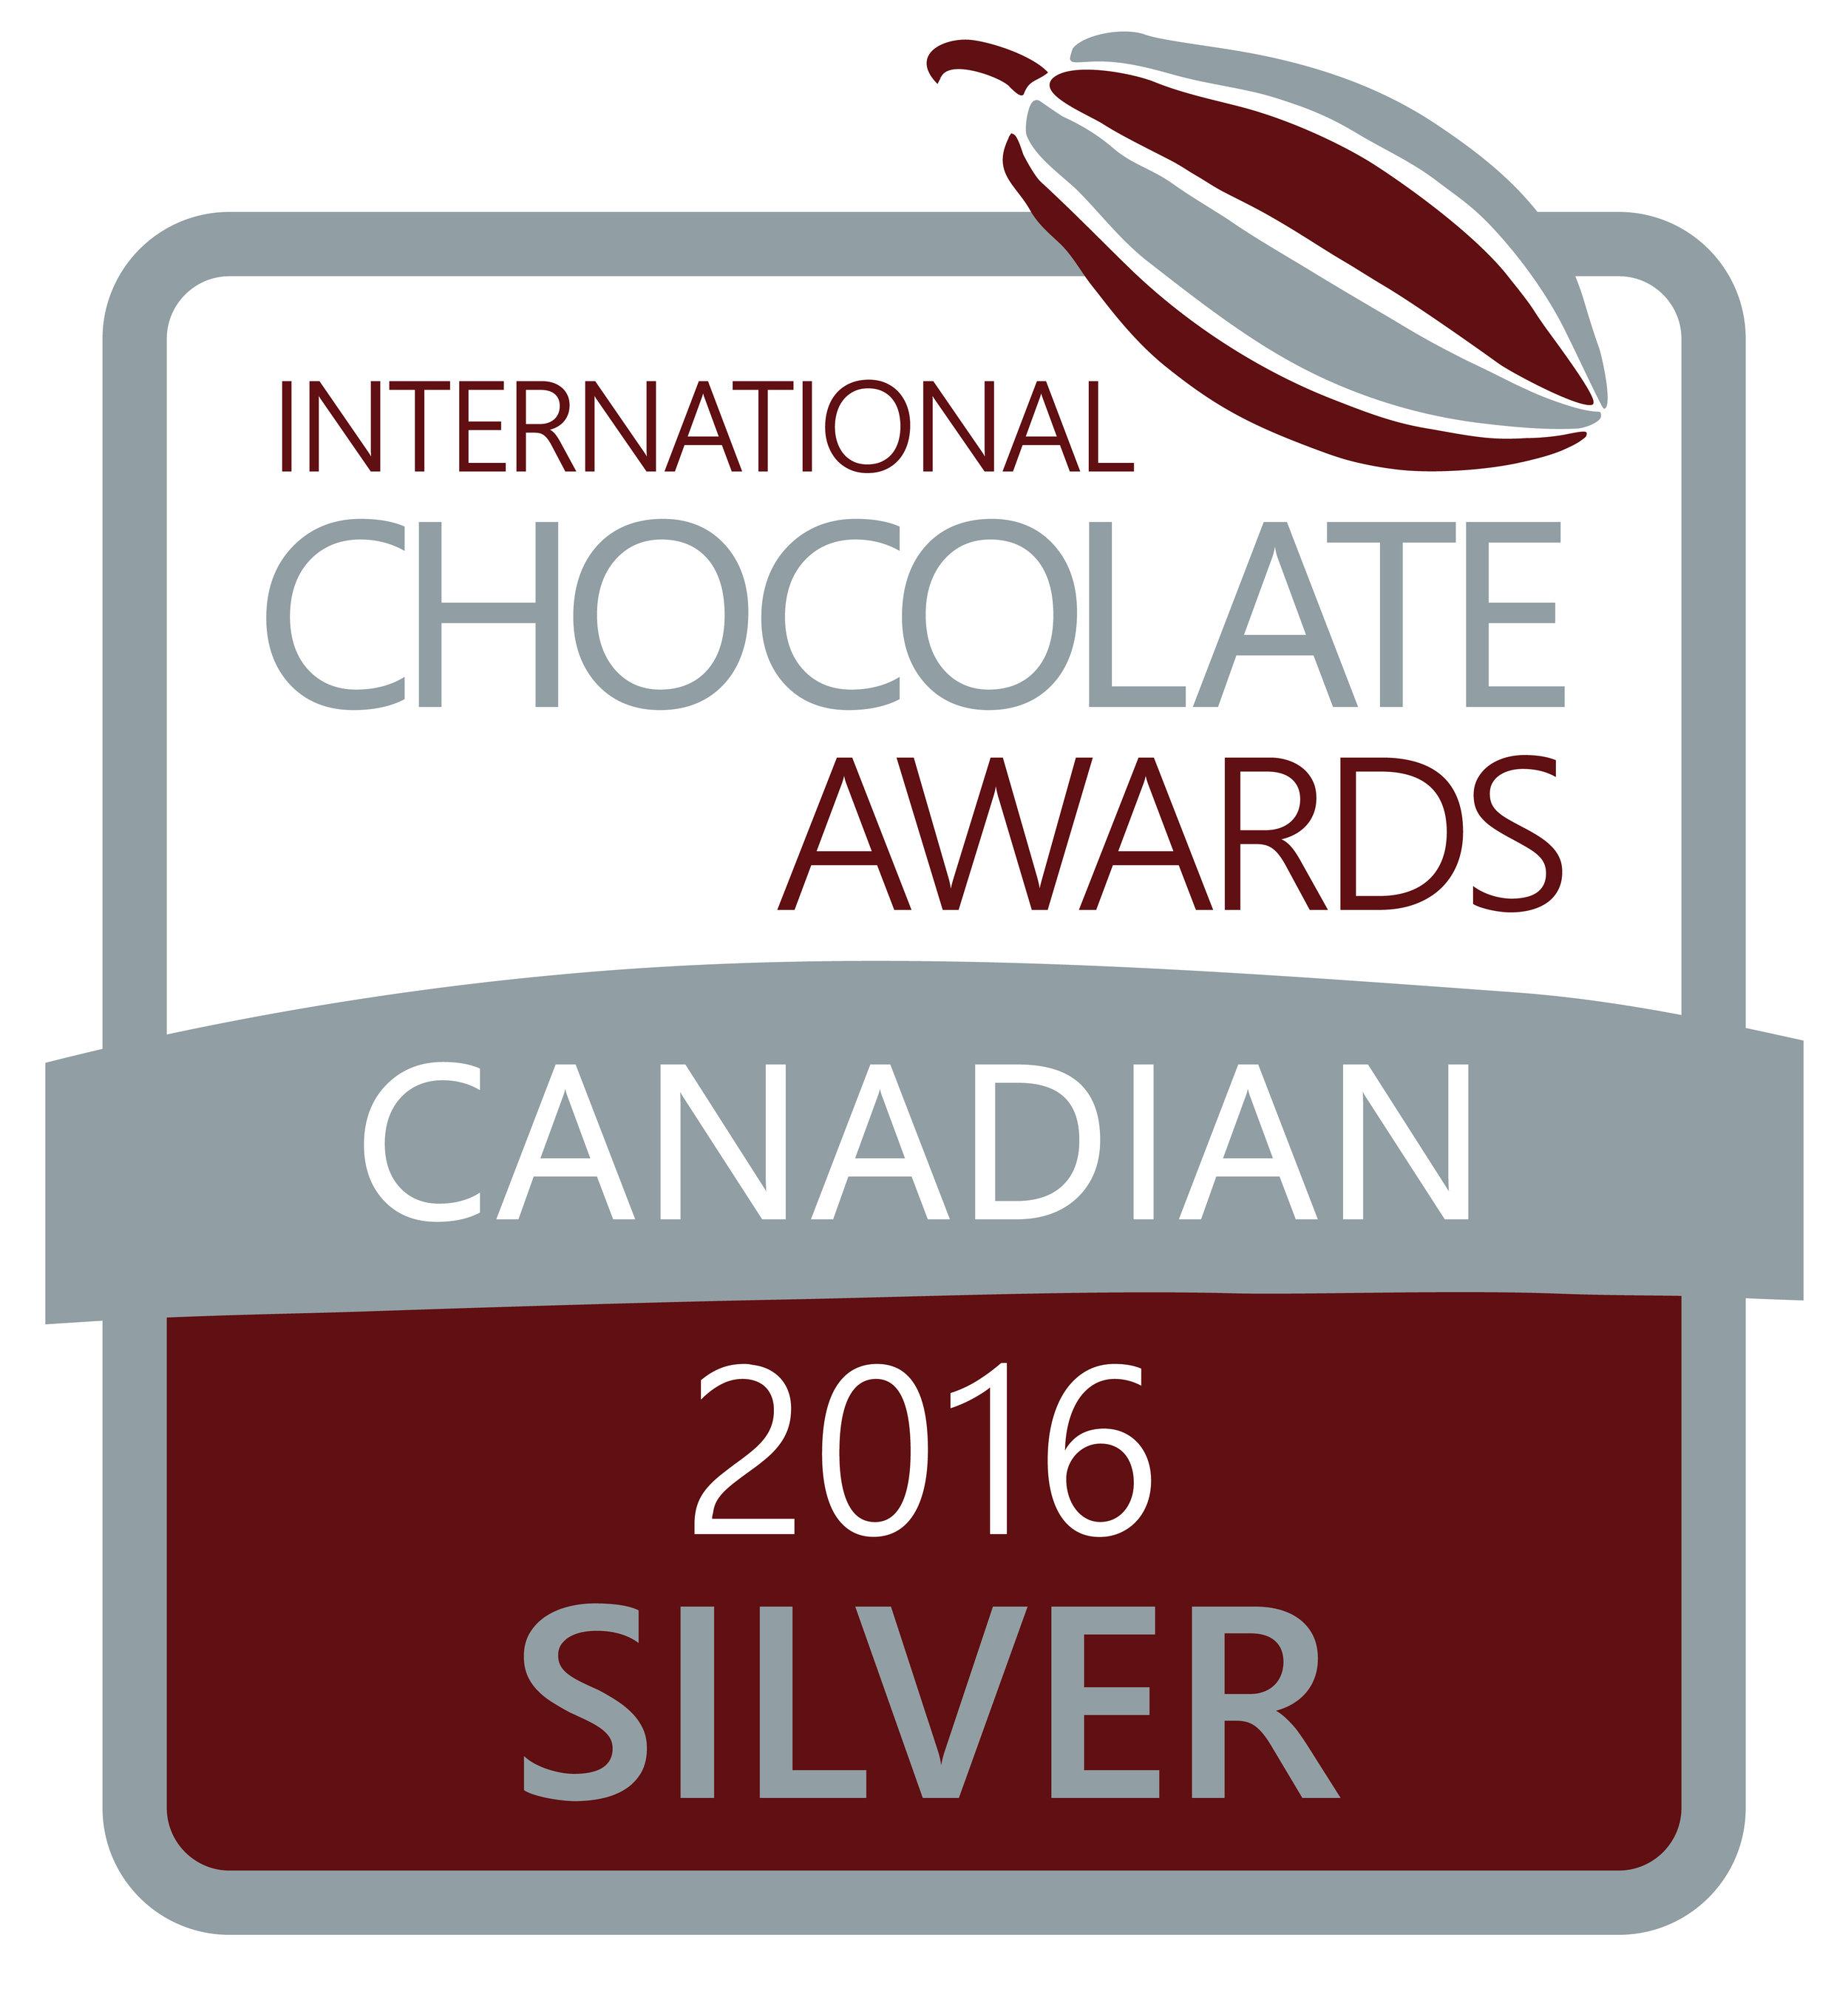 2016 Canadian Silver Winner International Chocolate Awards